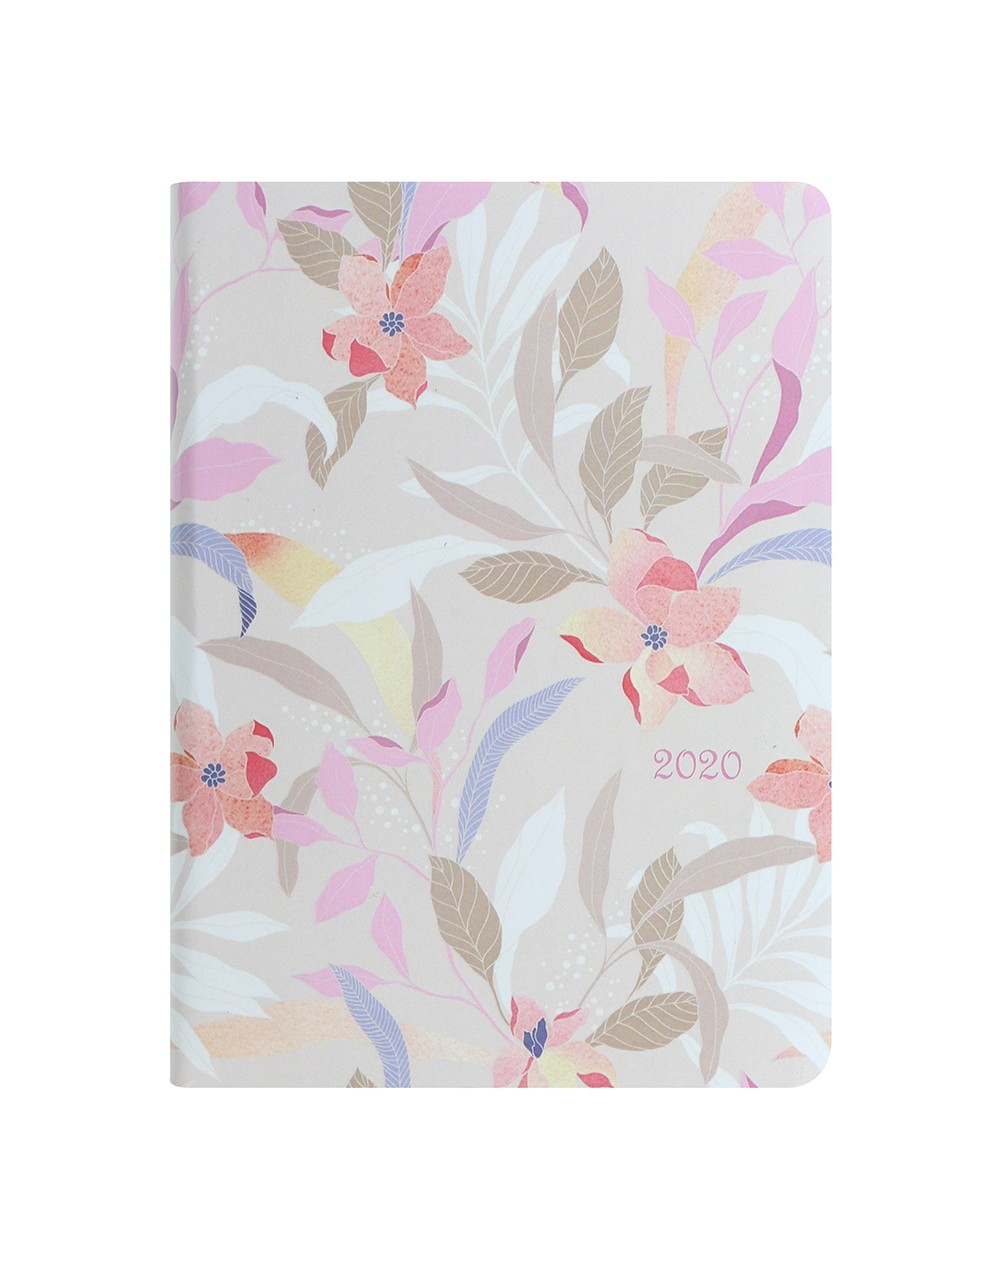 Flexi Pattern Botanical A5 Diary 2020 - Sharri Leather